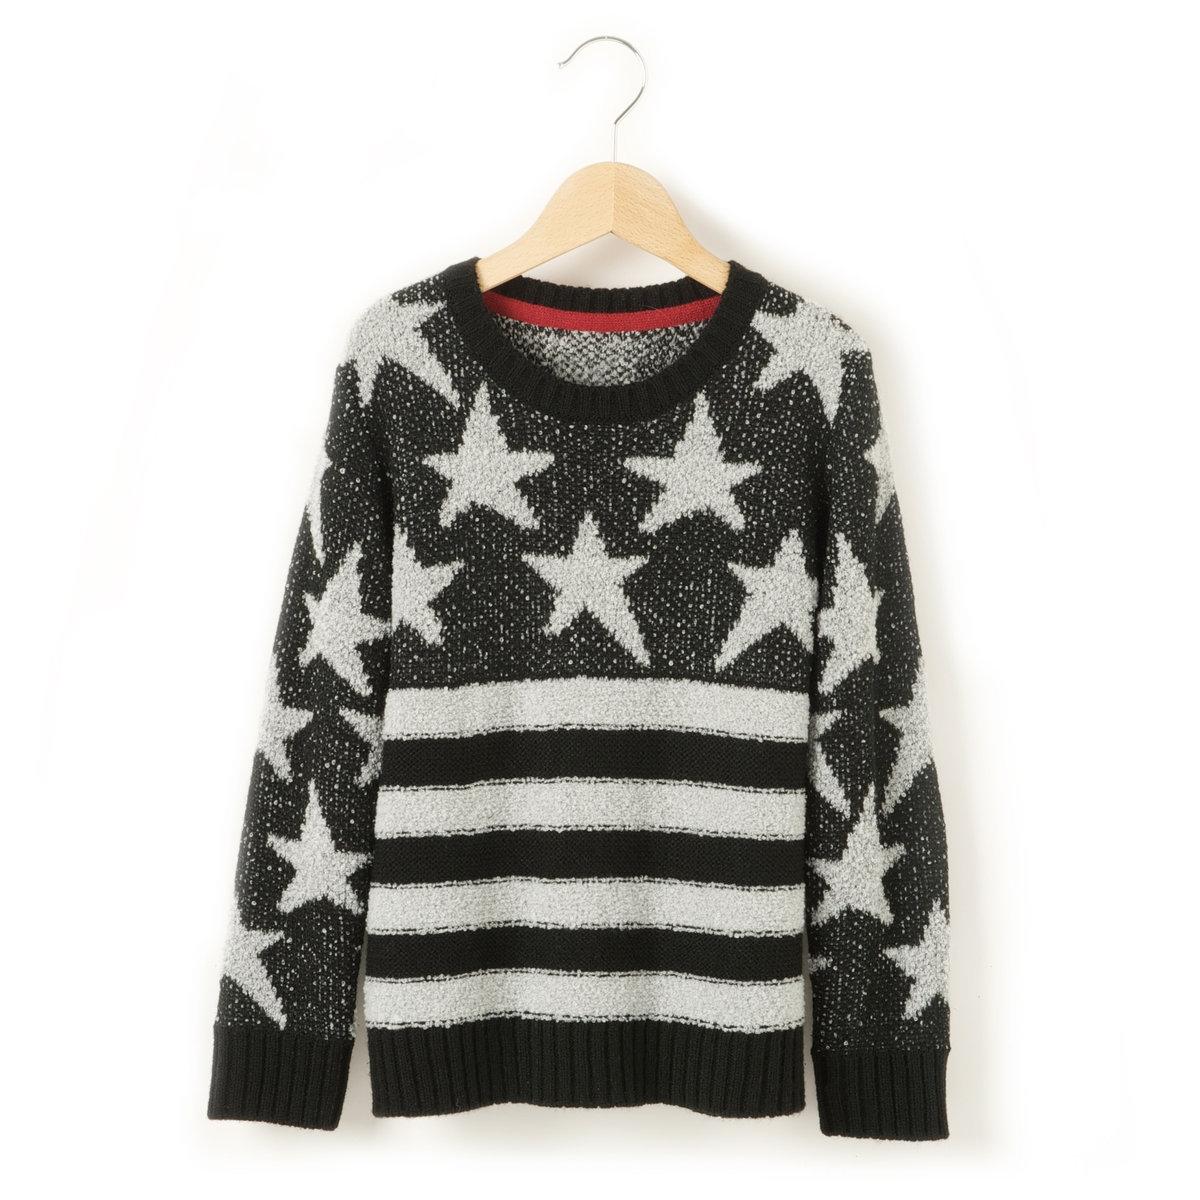 Пуловер с флагом, 3-12 лет от La Redoute